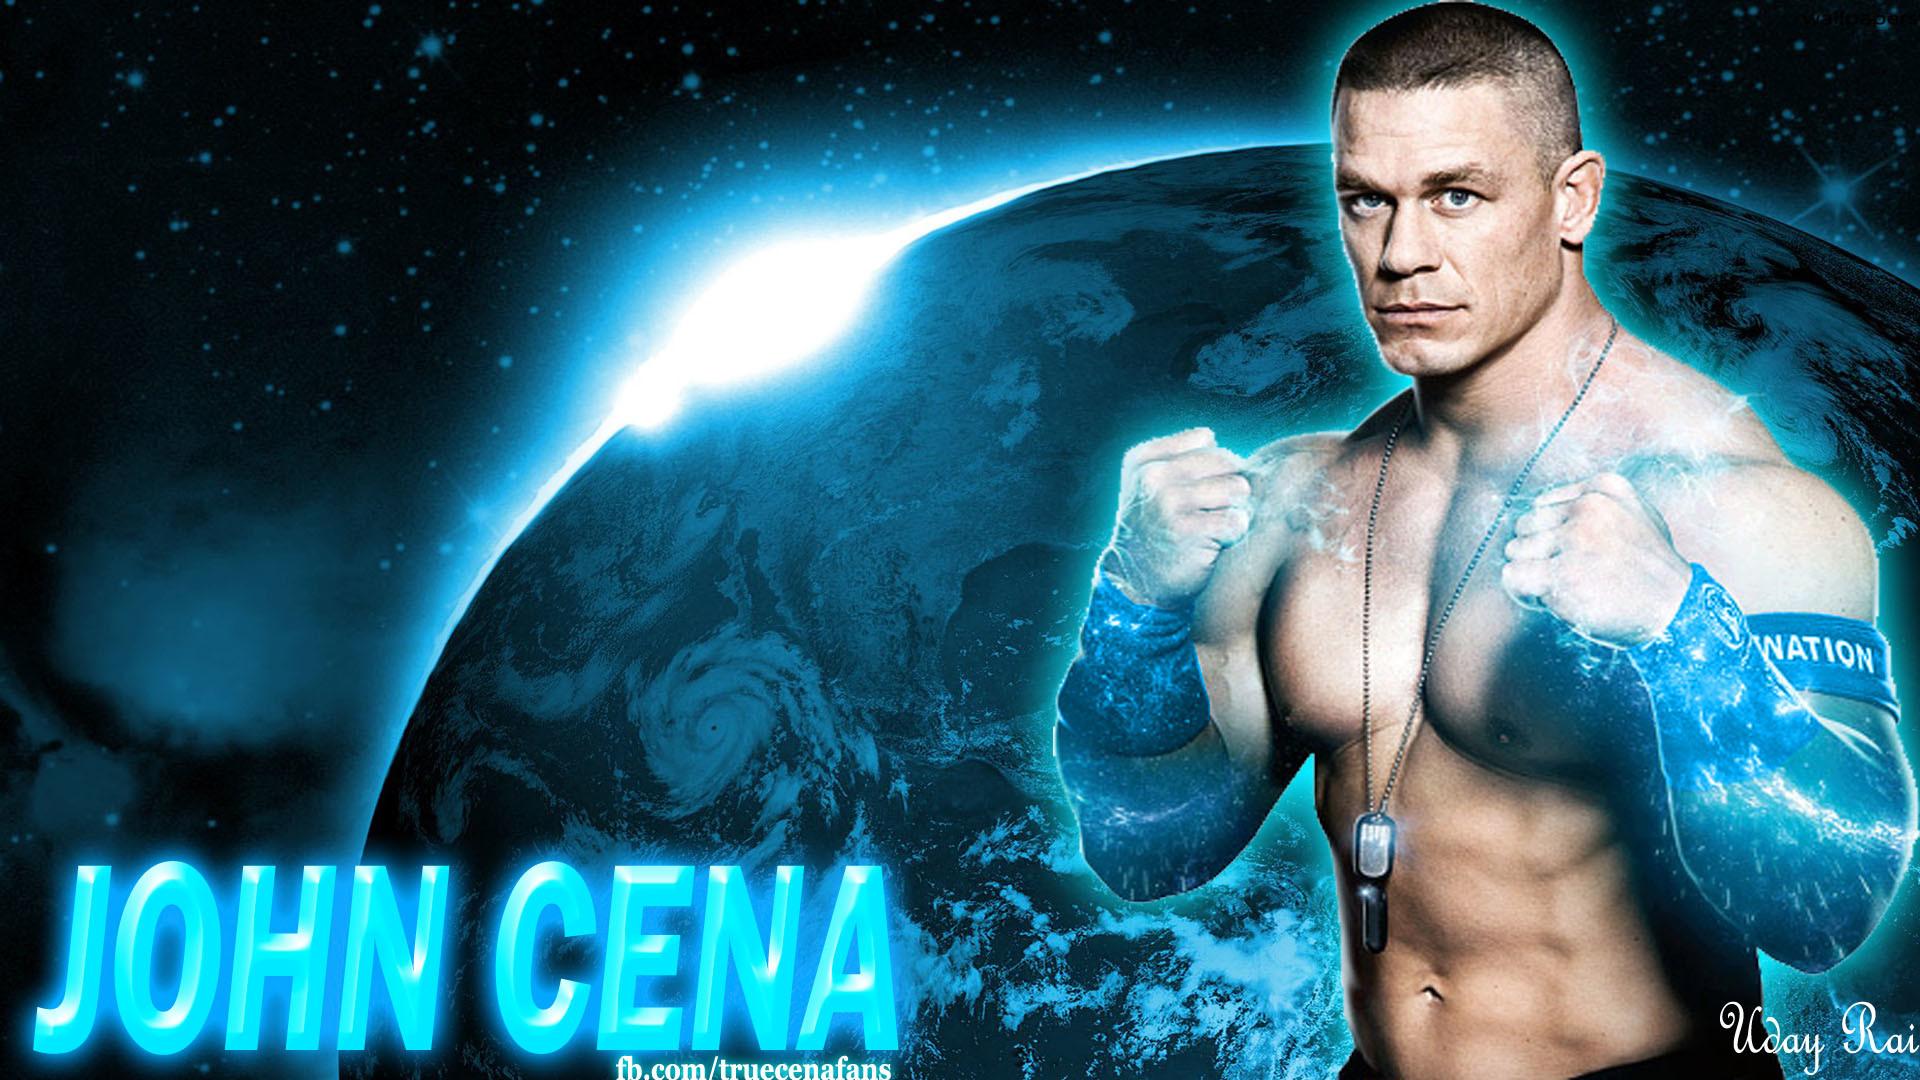 John Cena Background Wallpapertag